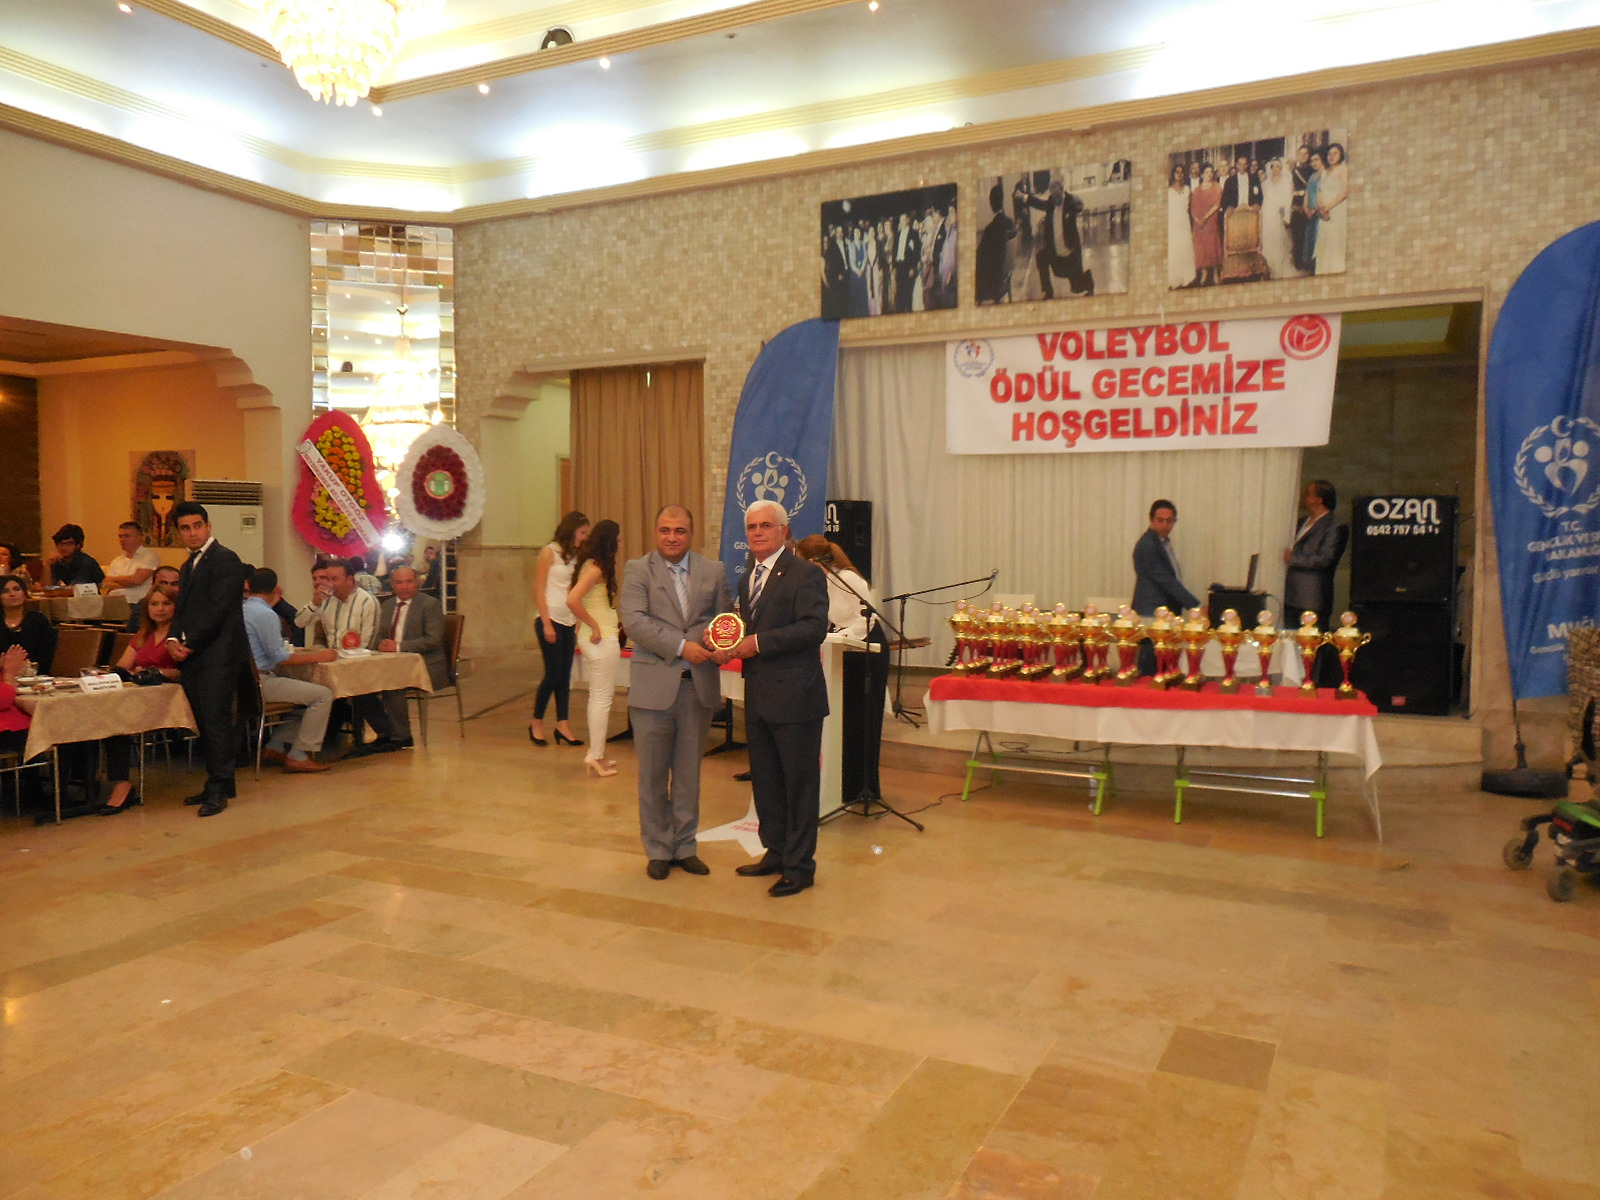 VOLEYBOL AİLESİNDEN FEDERASYON BAŞKANIMIZA ÖDÜL